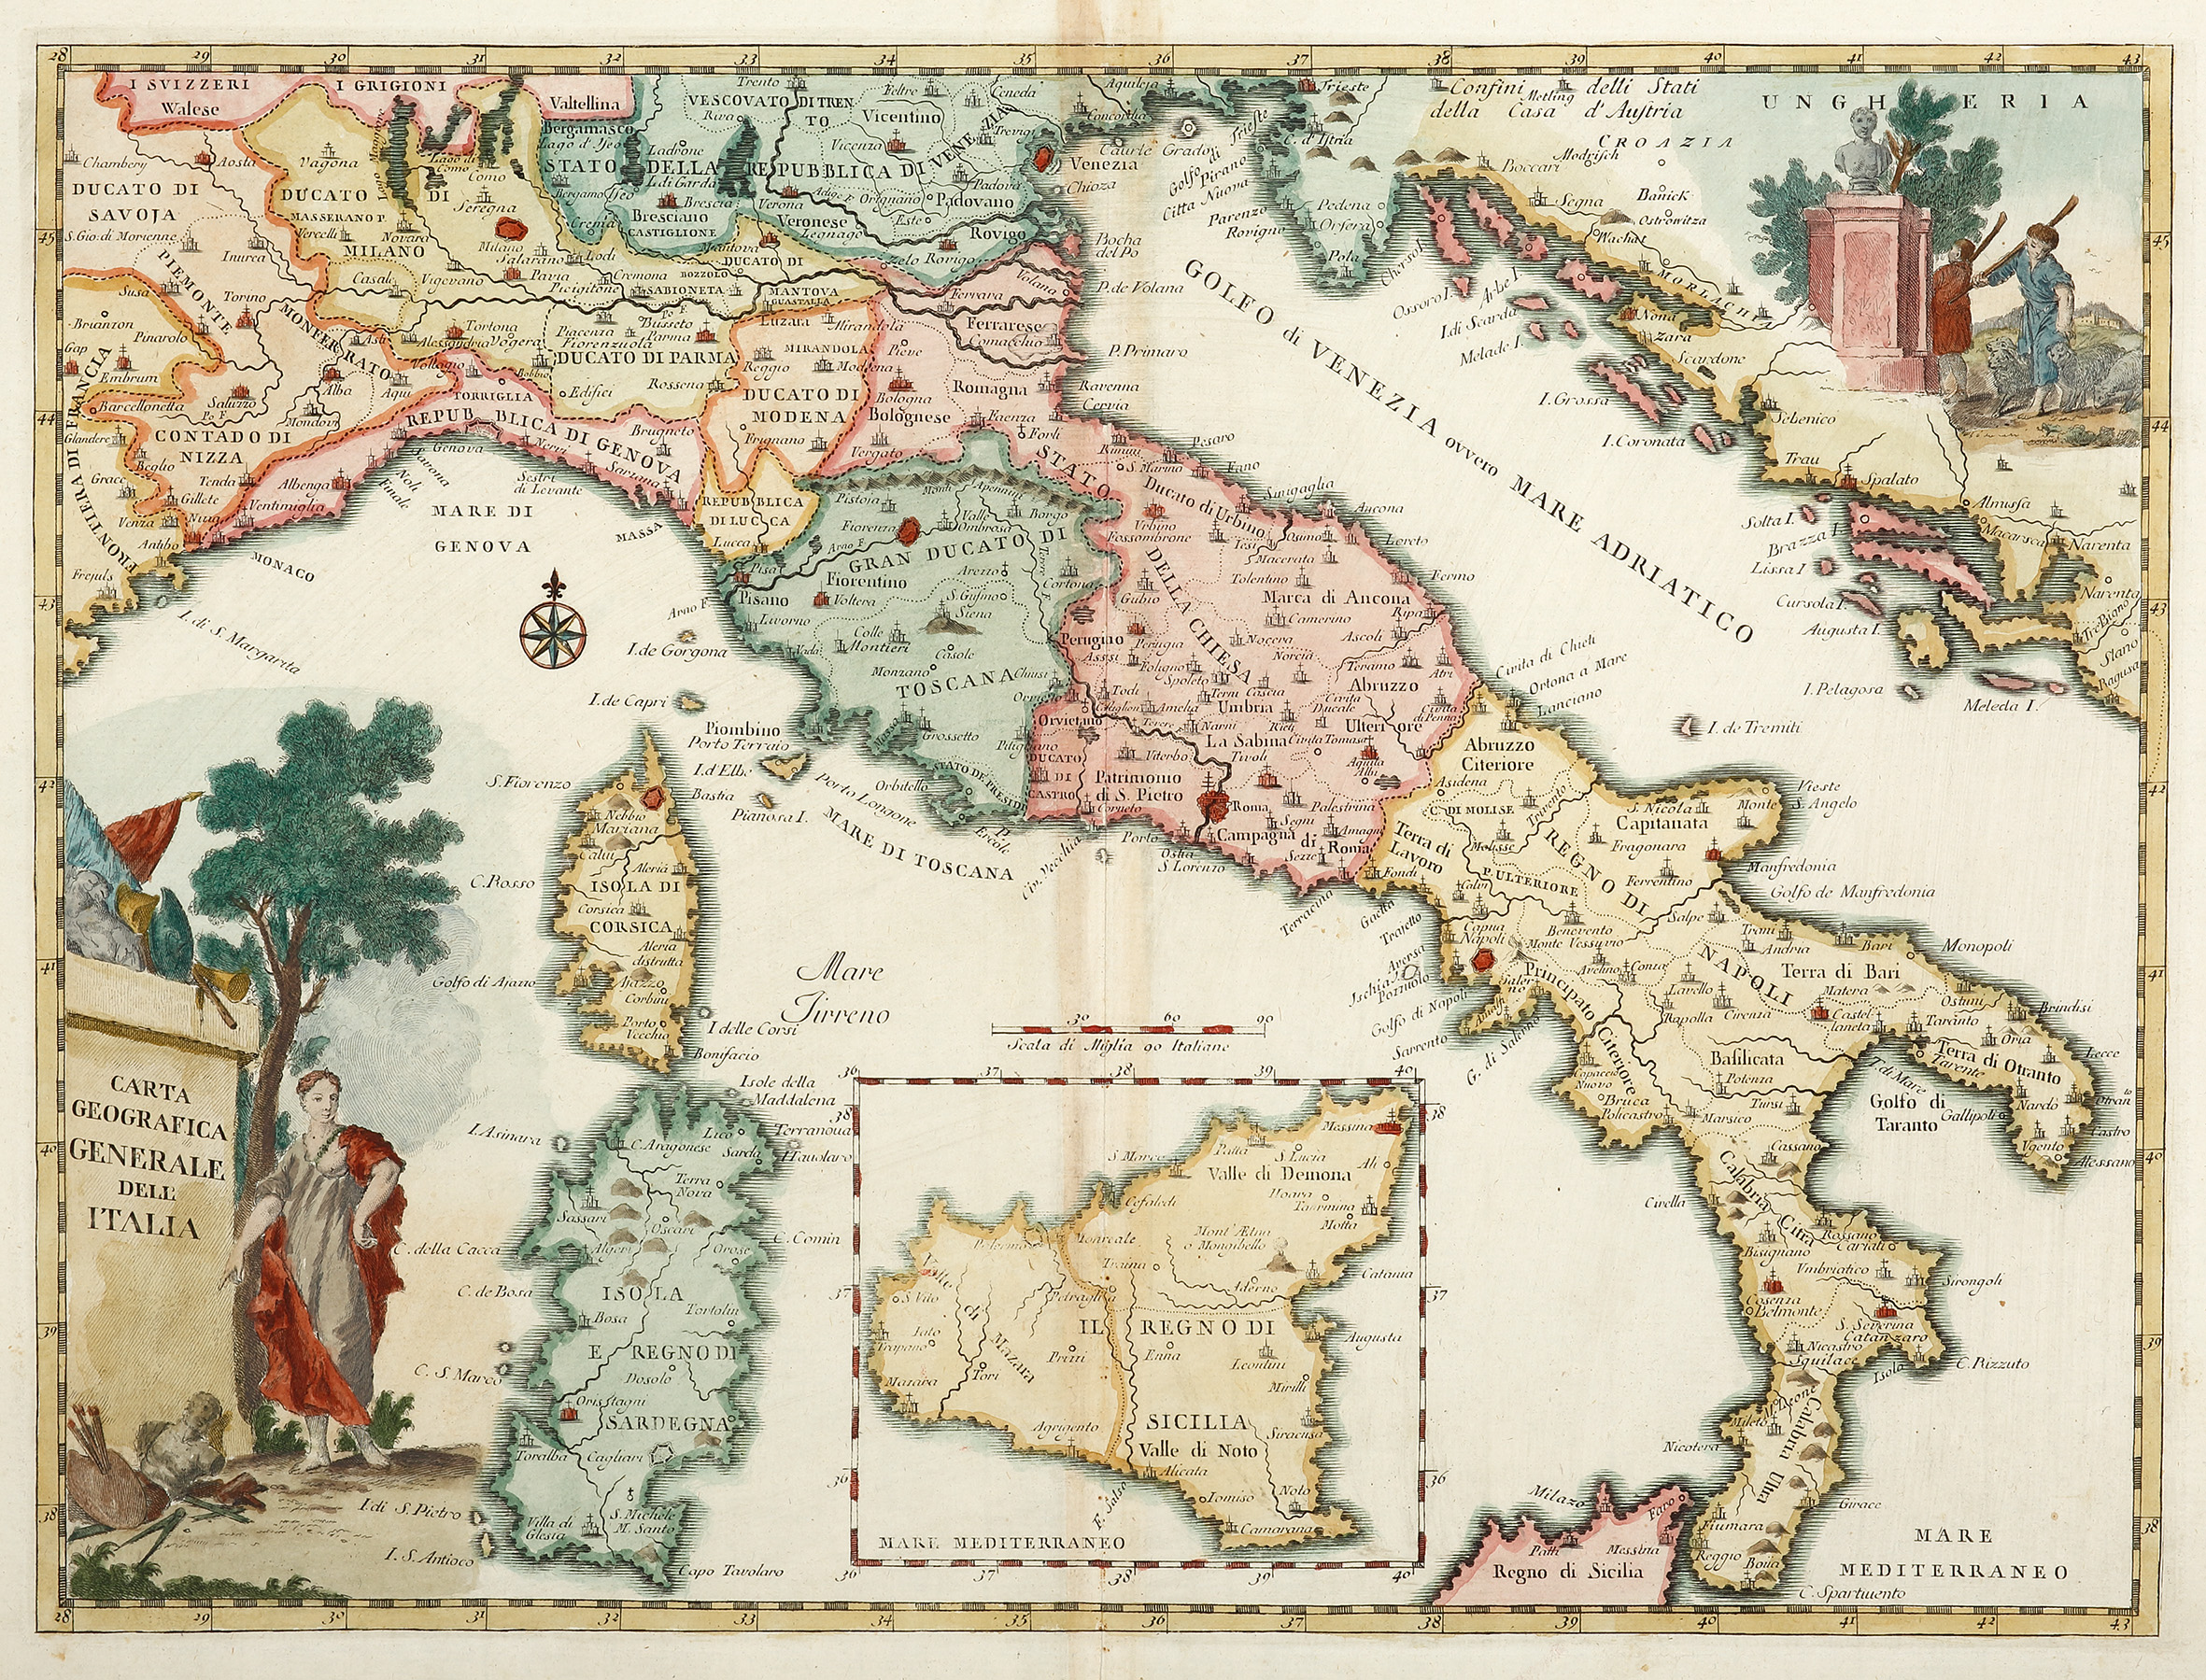 Cartina Geografica Italia 2017.Carta Geografica Generale Dele Italia Antique Print Map Room